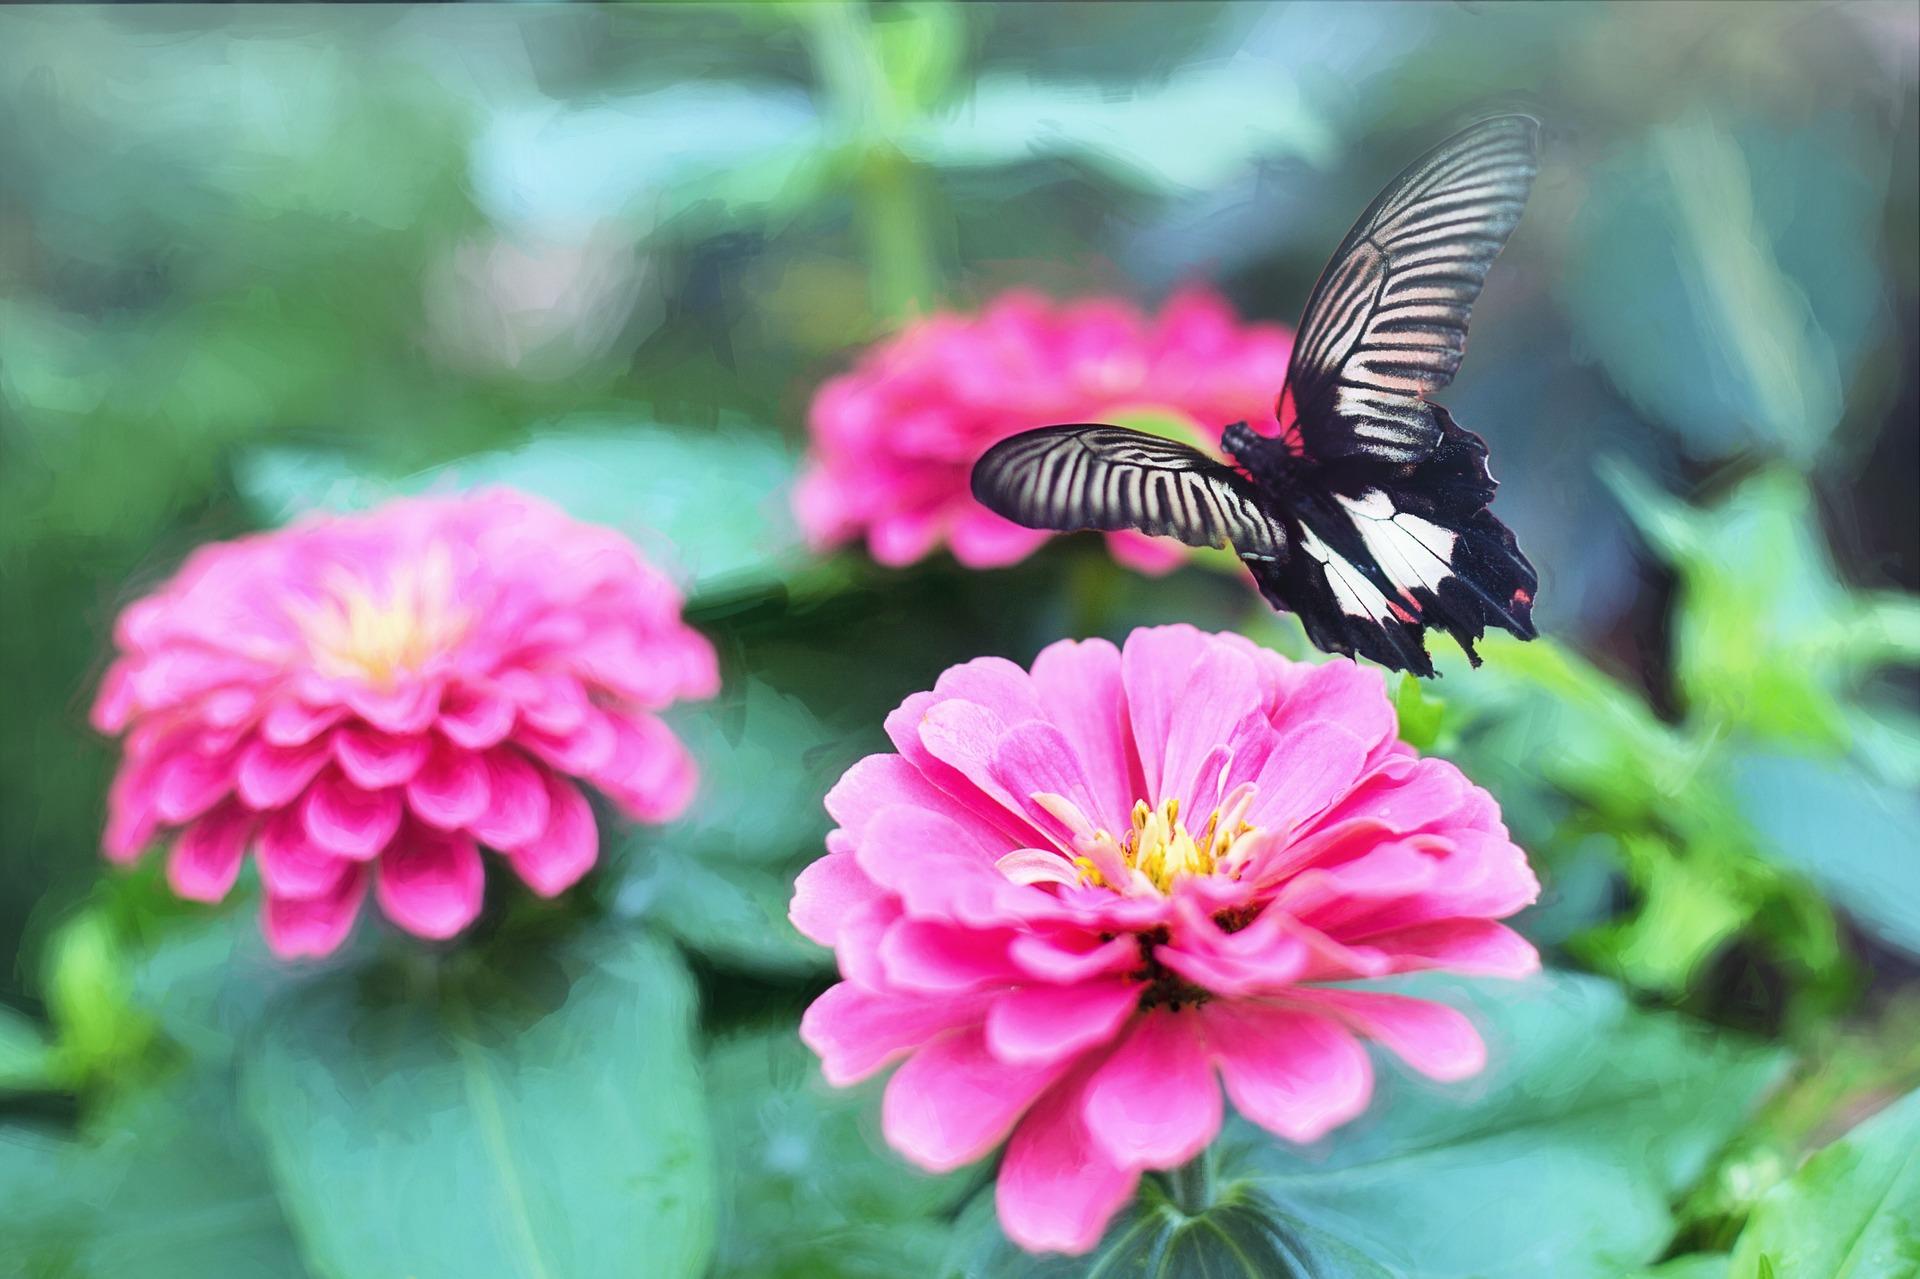 Butterfly in the garden photo